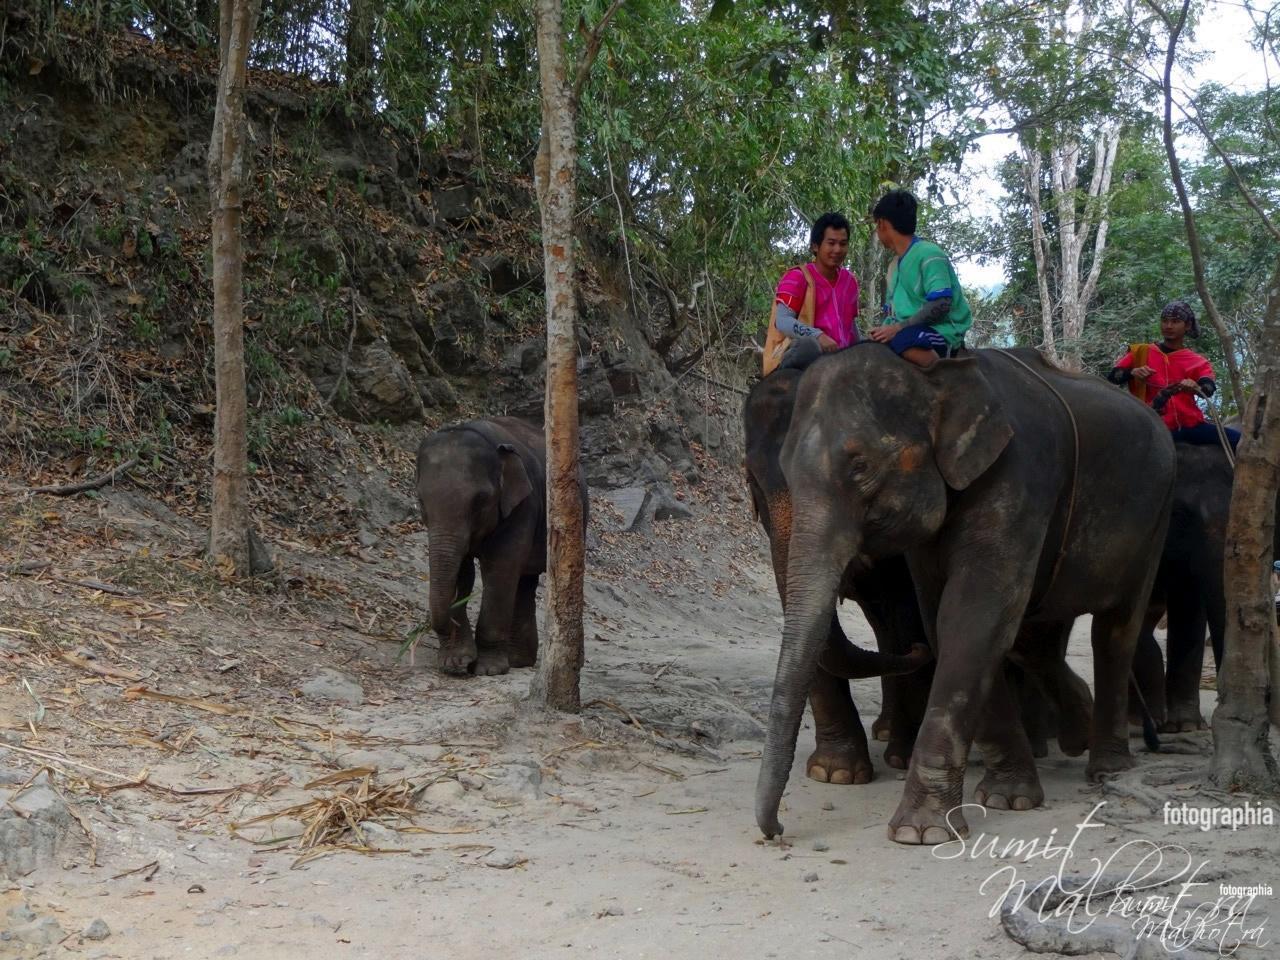 Patara Elephant Farm, Chiang Mai